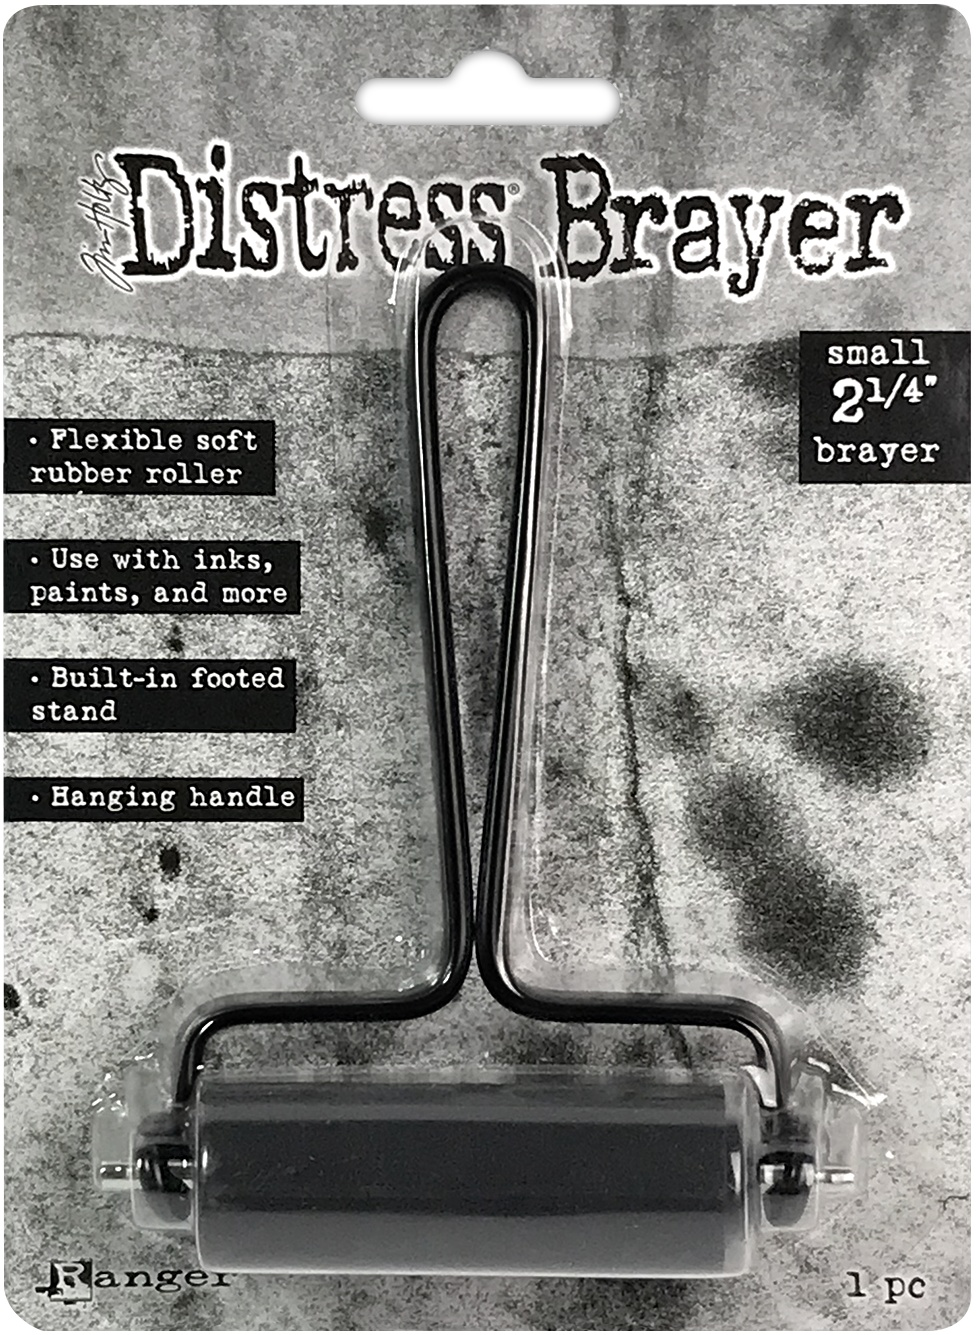 Tim Holtz Distress Brayer-Small